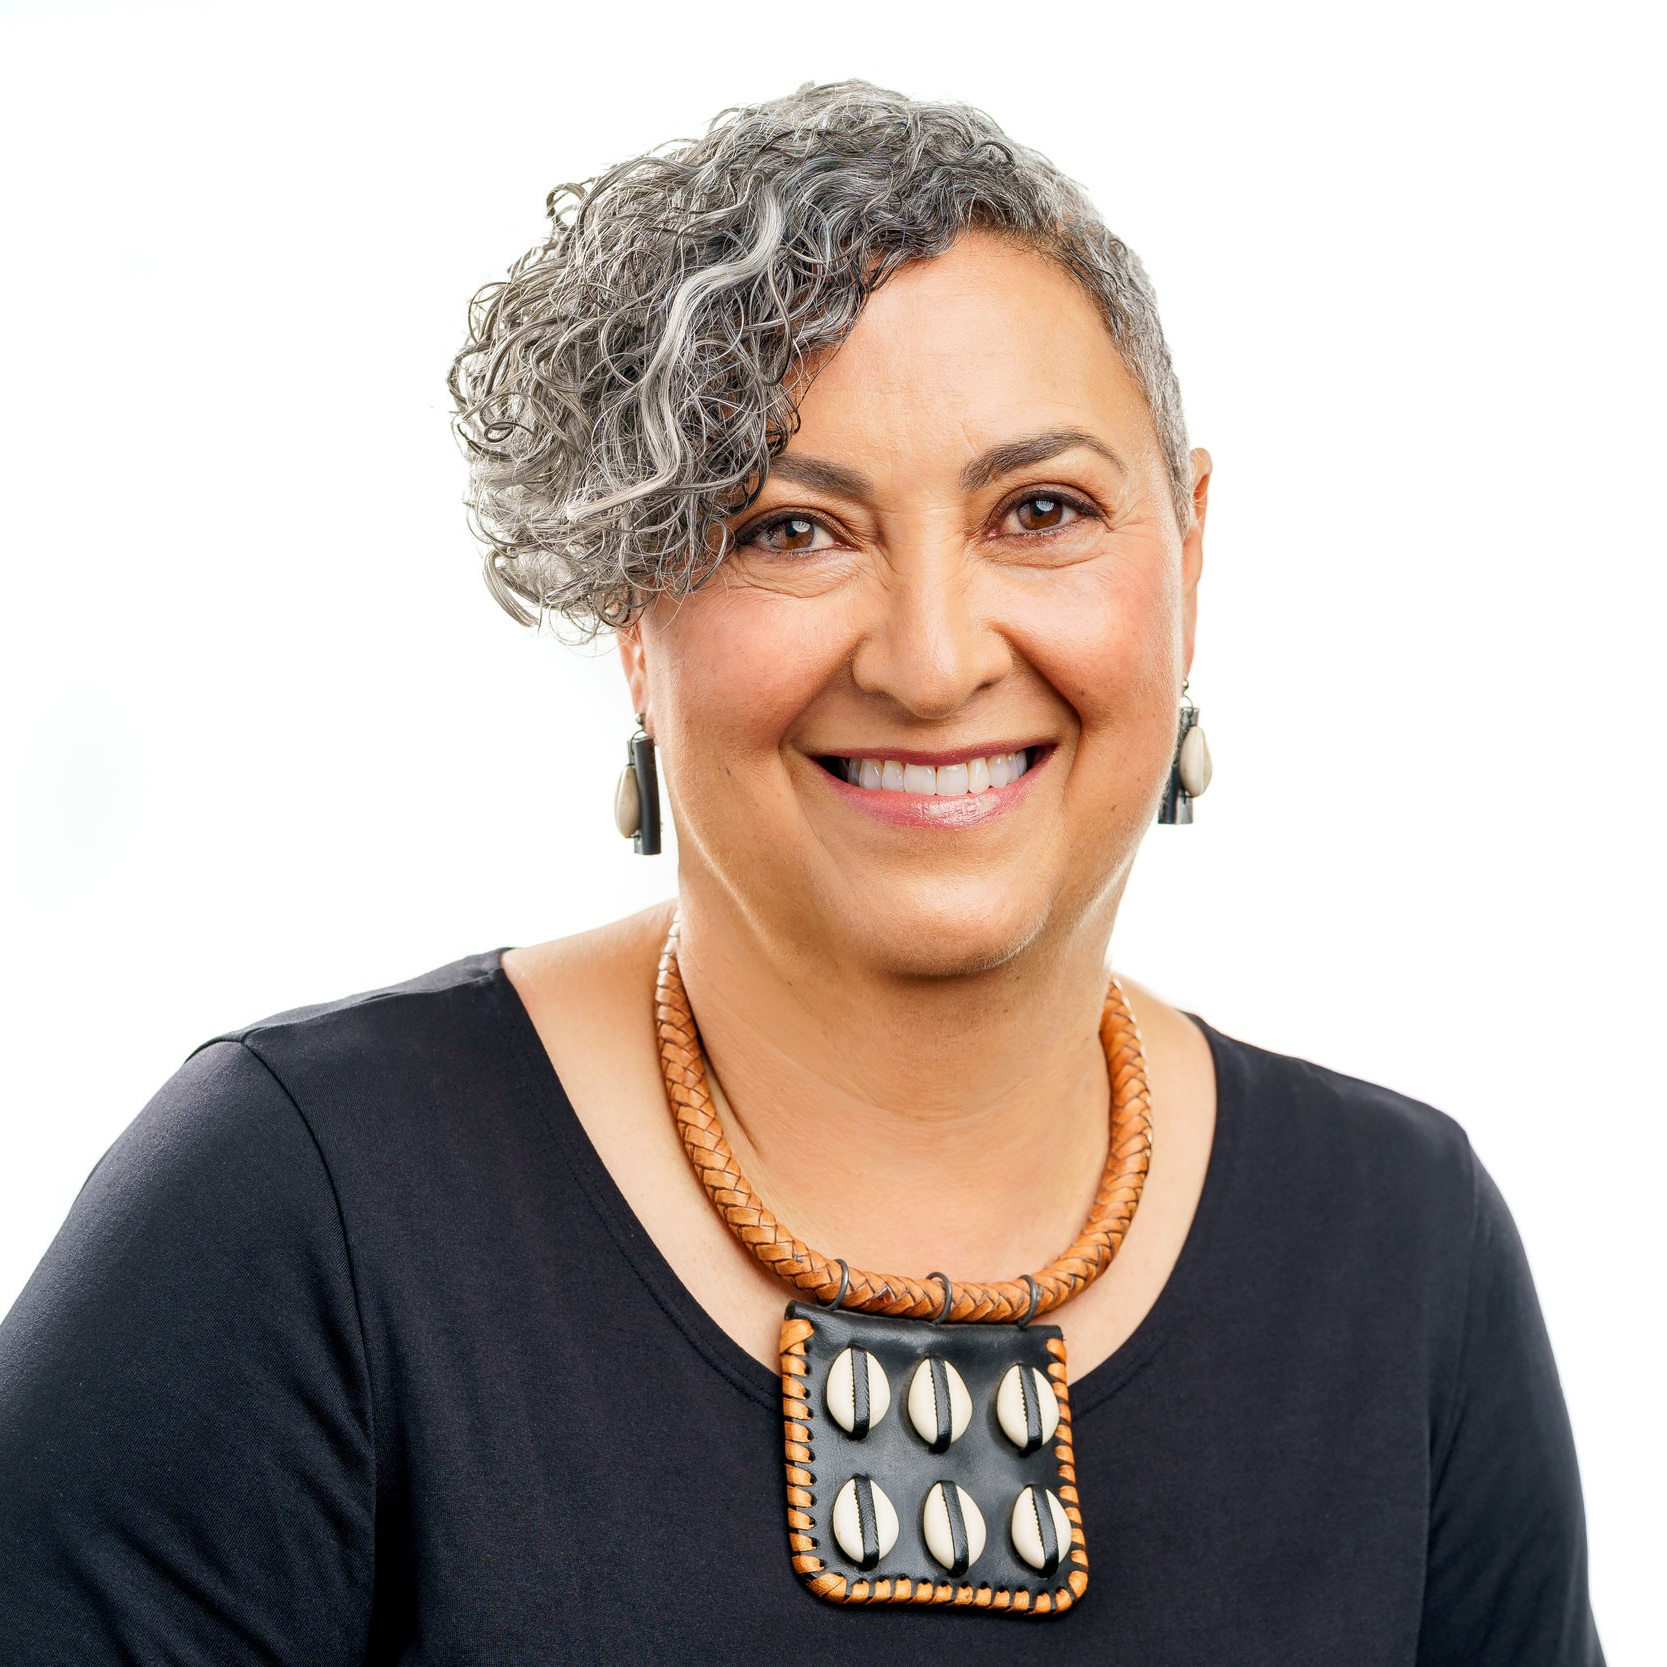 Saundra Davis, Founder & Executive Director, Sage Financial Solutions